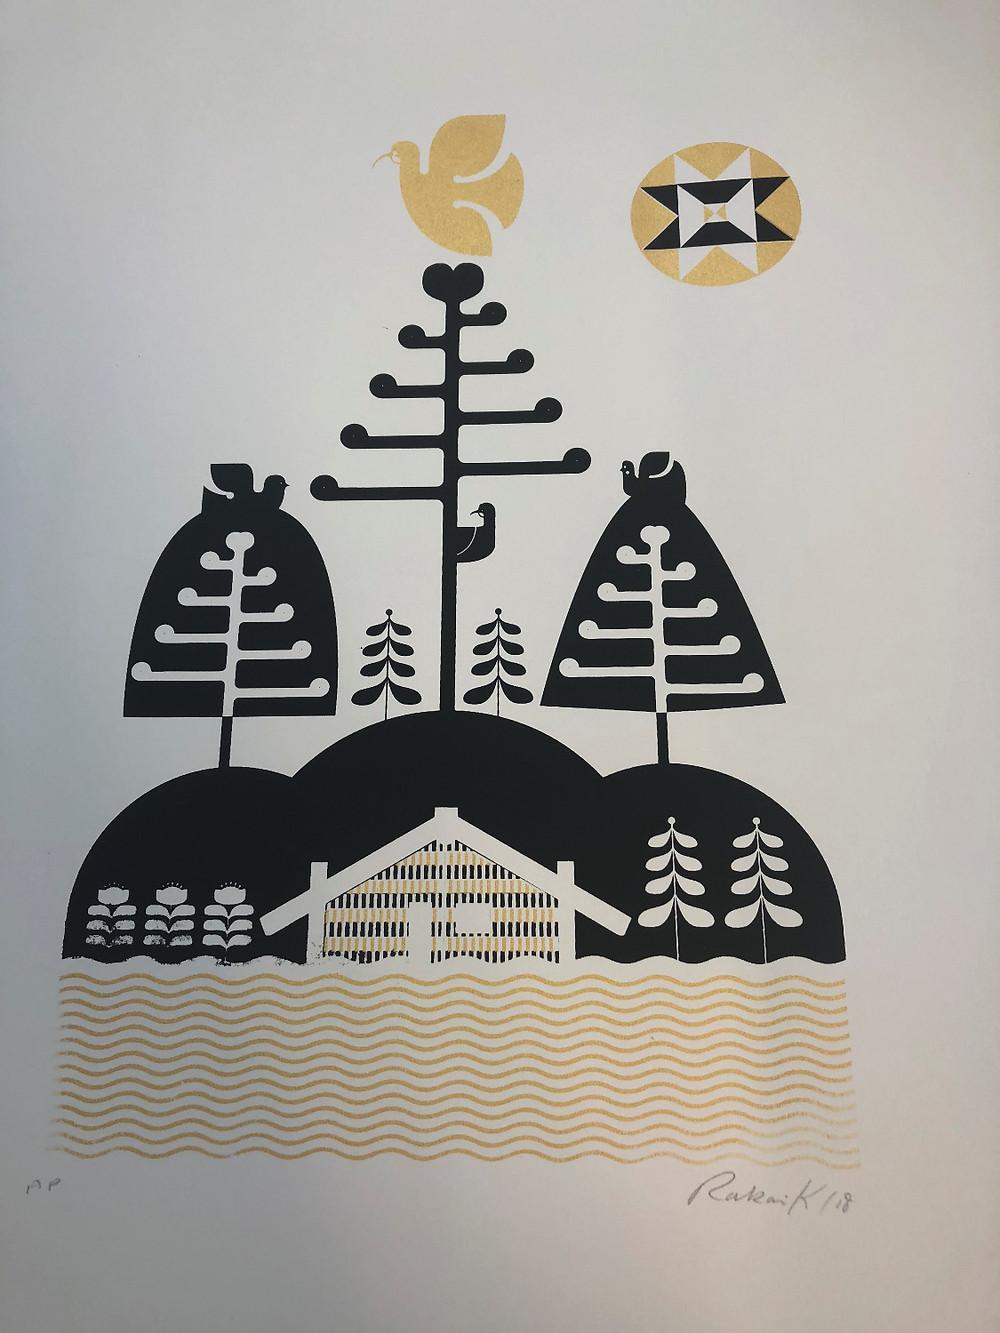 What a work: One of the limited edition prints by Aroha and Friends artist Rakai Karaitiana.